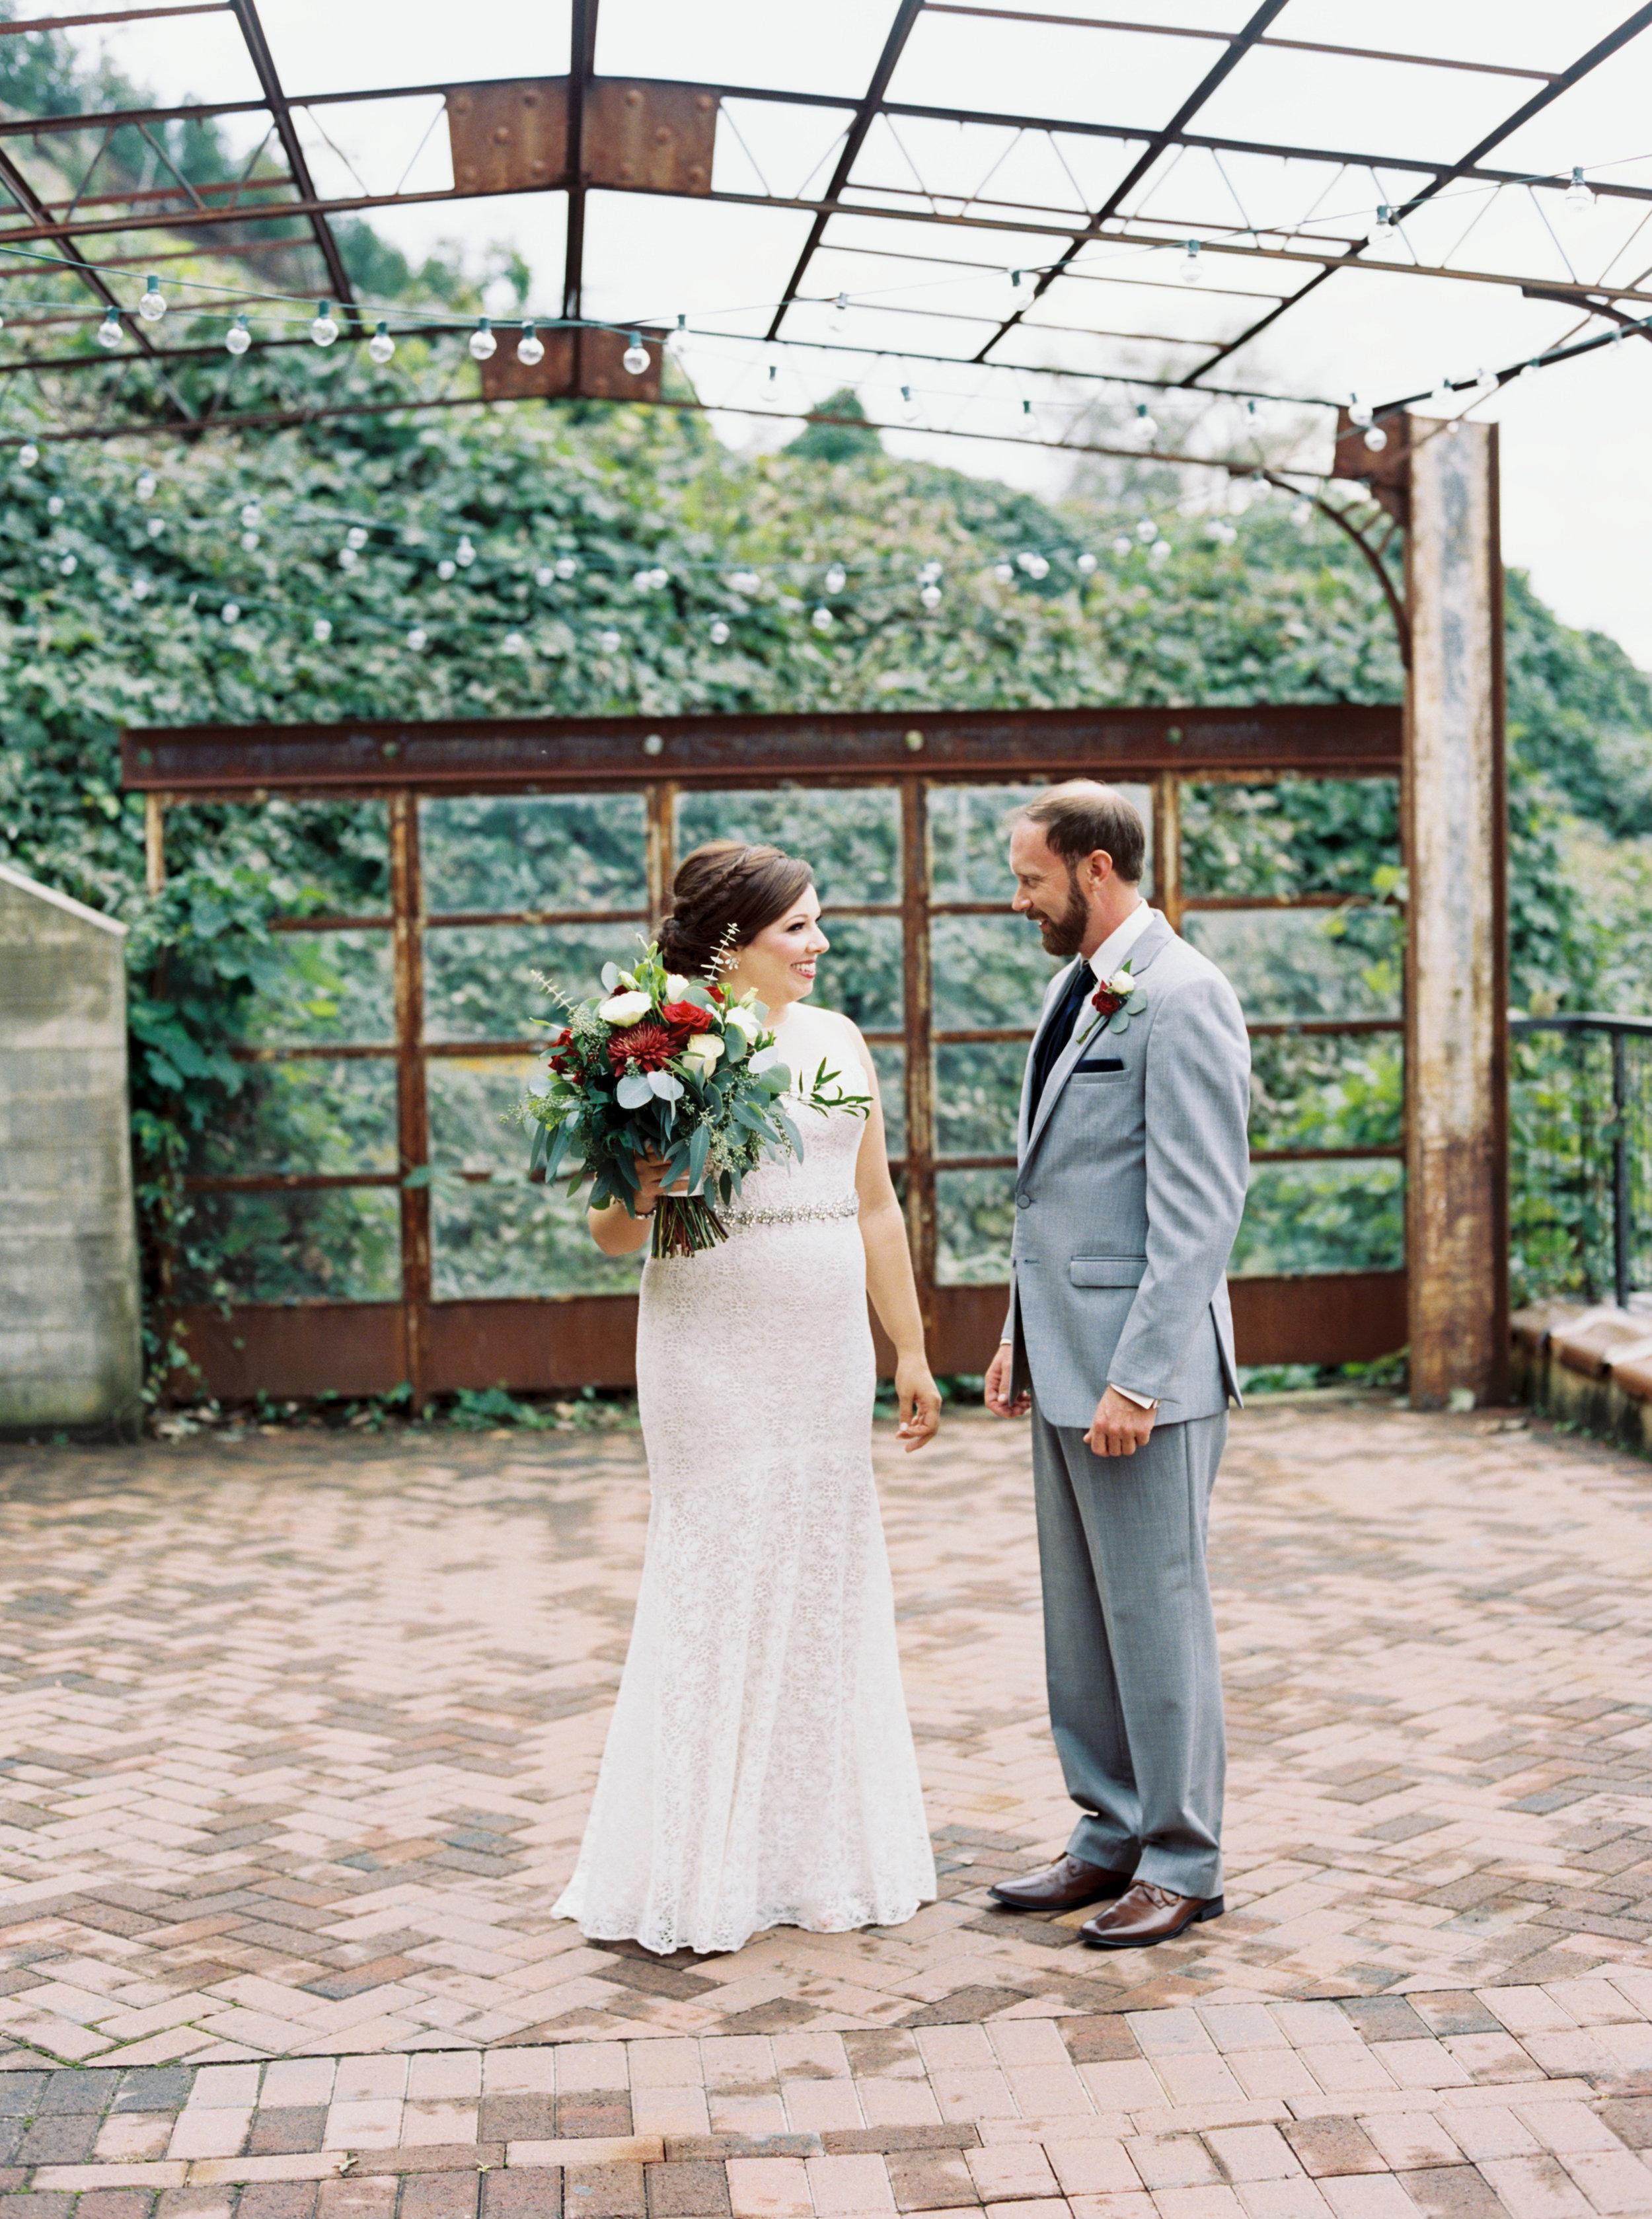 Jessica_Bryan_Wedding_Standard_Knoxville_Abigail_Malone_Photography-179.jpg